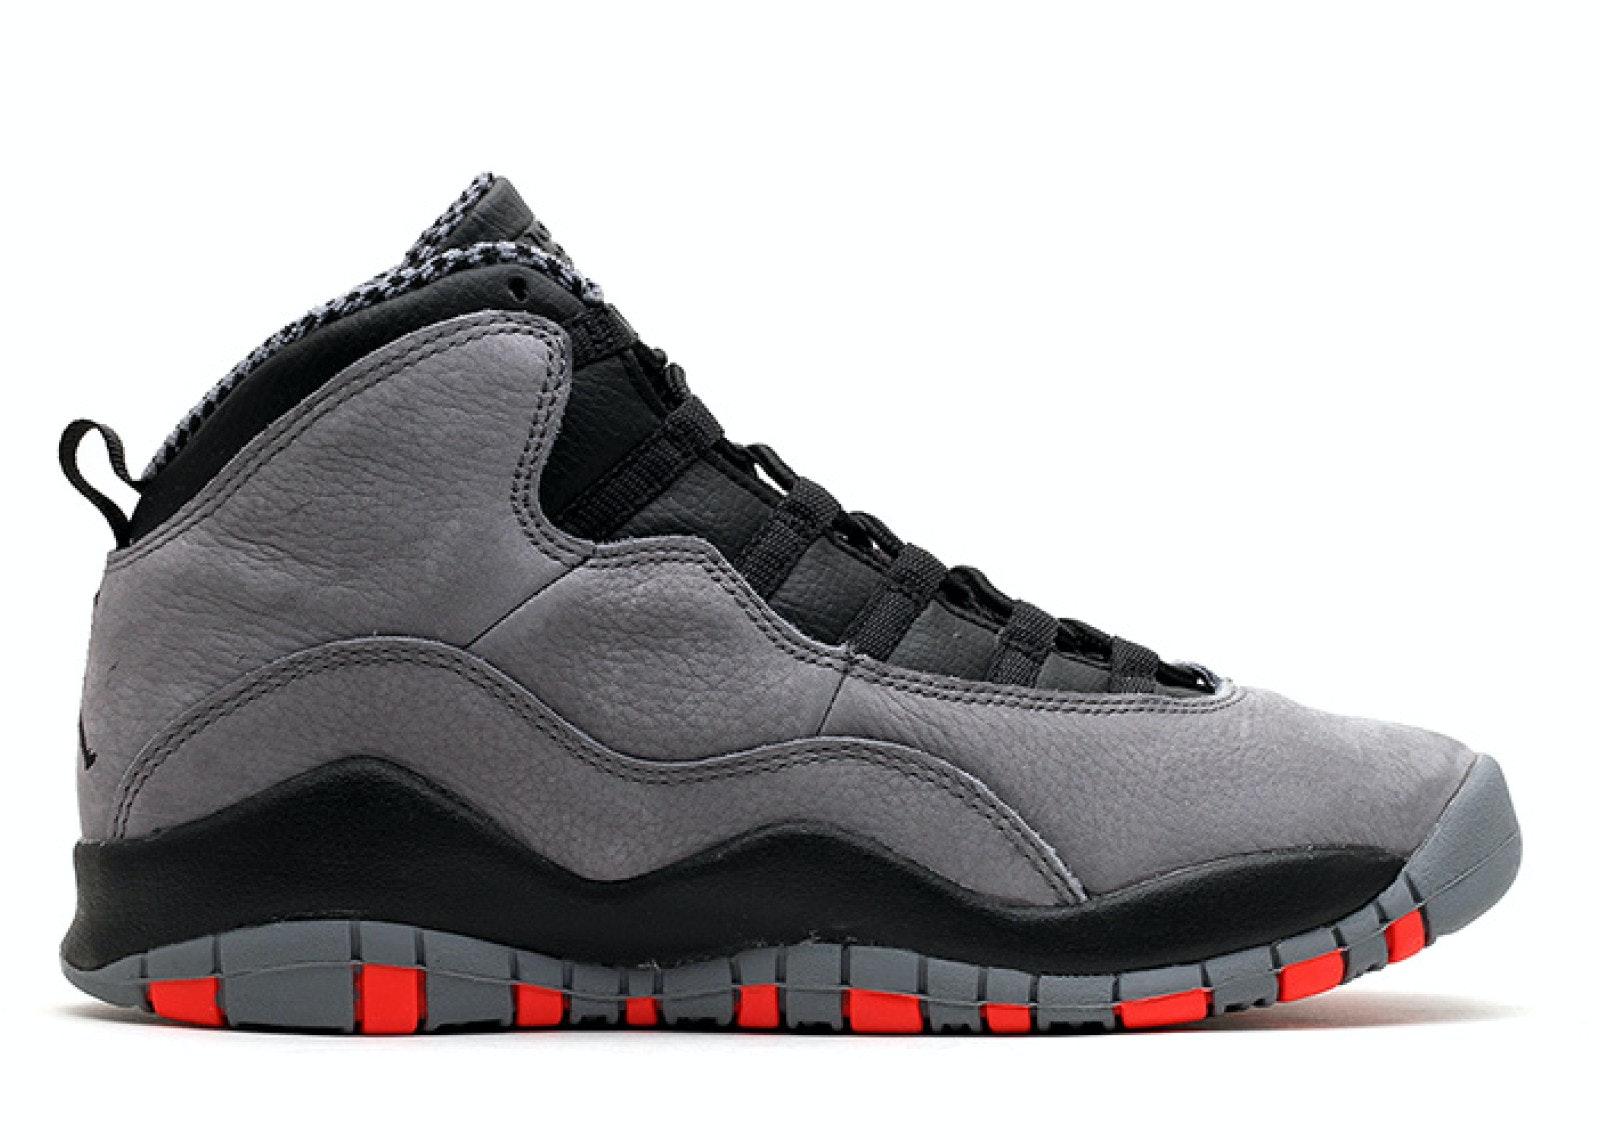 Jordan 10 Retro Cool Grey (GS)